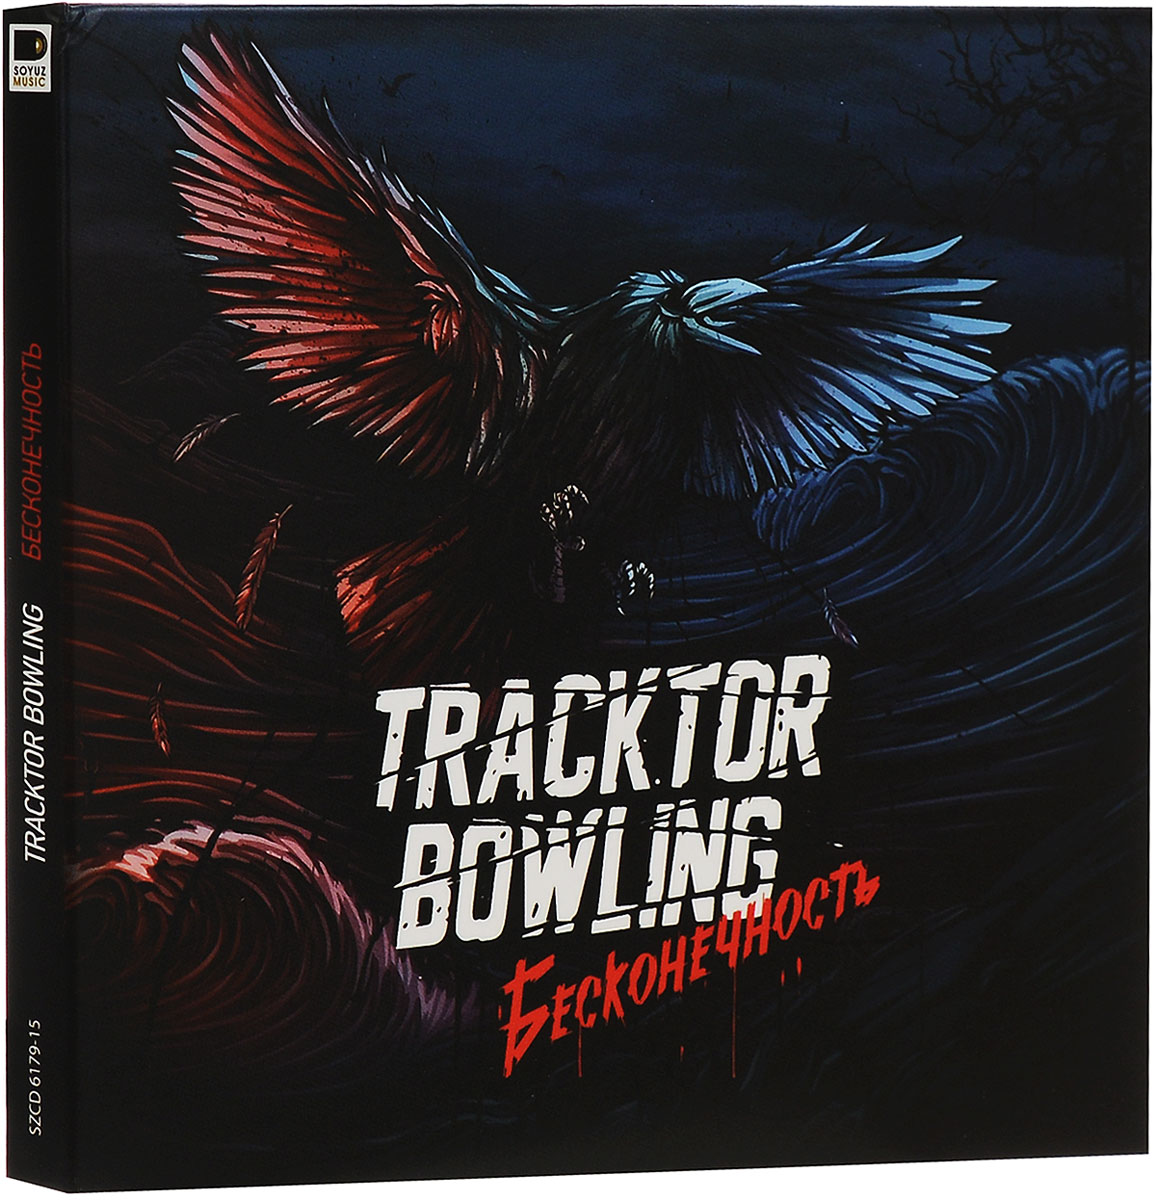 Tracktor Bowling Tracktor Bowling. Бесконечность black lt decker компрессор масляный